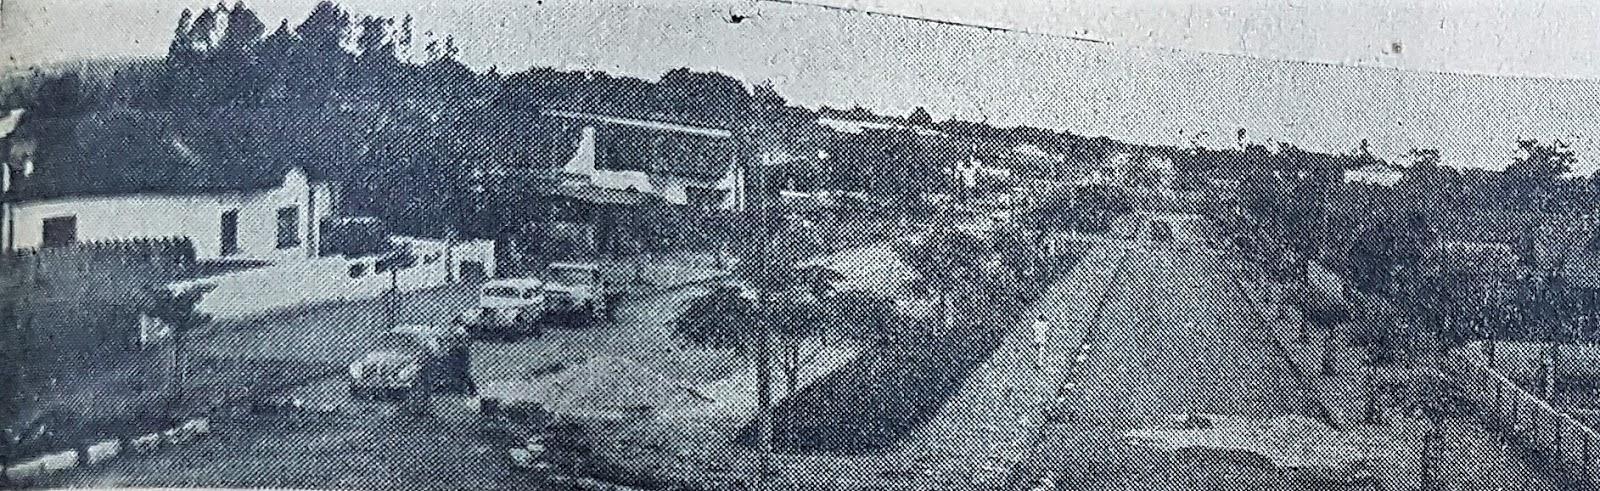 Avenida Cerro Azul - 1964